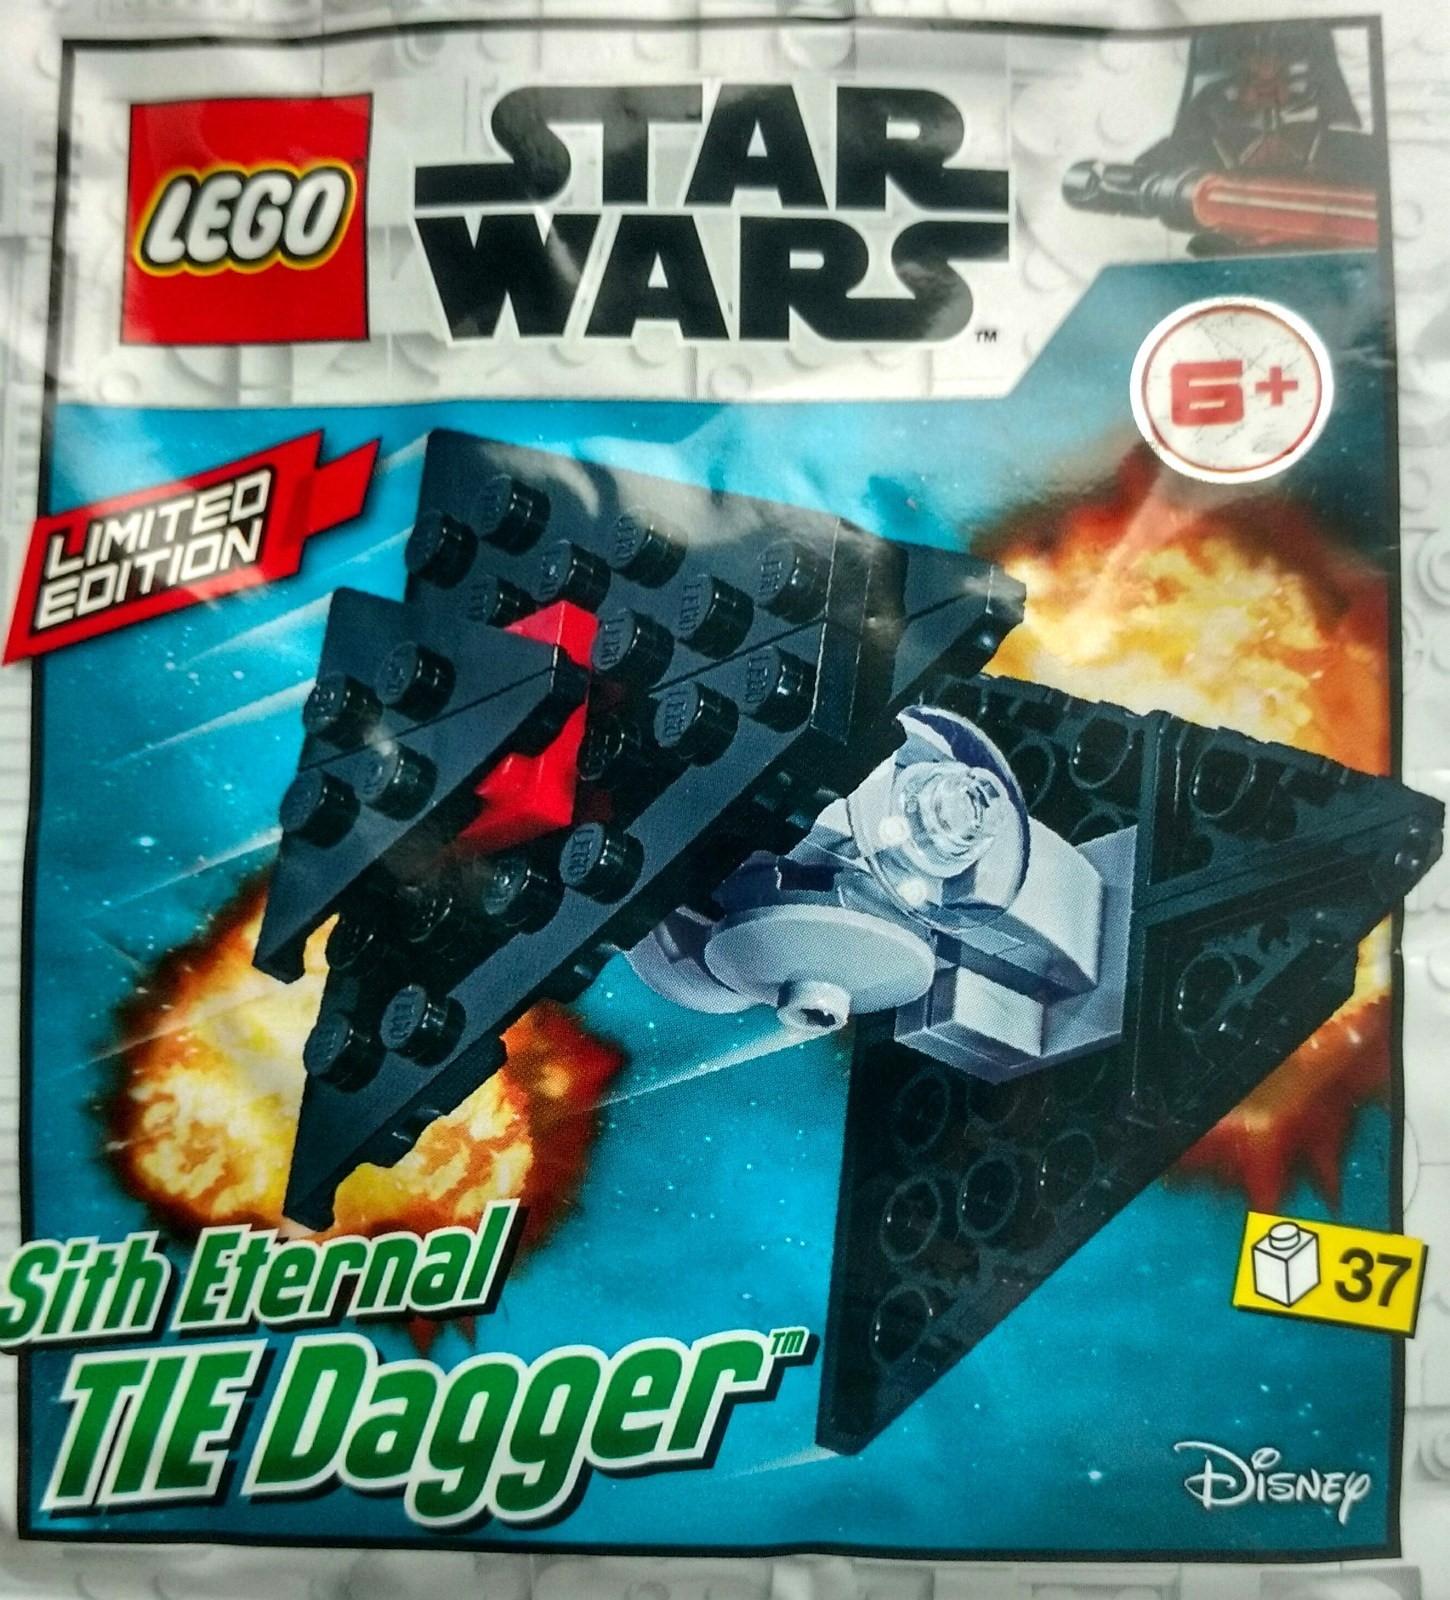 912064 TIE Dagger